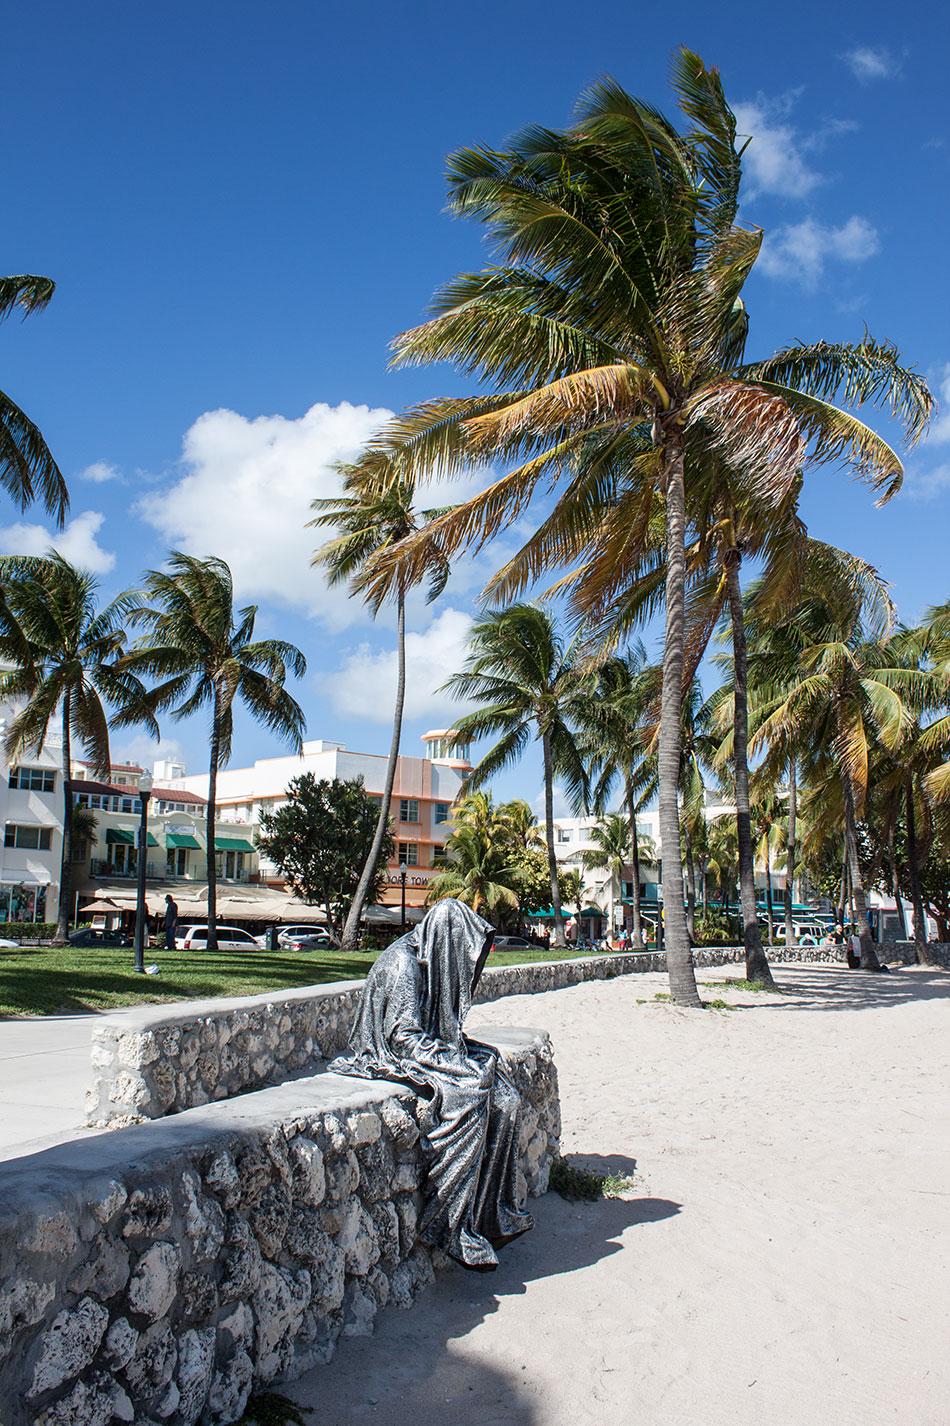 public-art-basel-miami-beach-fair-usa-florida-bass-museum-guardians-of-time-manfred-kili-kielnhofer-contemporary-fine-art-modern-arts-design-antiques-sculpture-6560